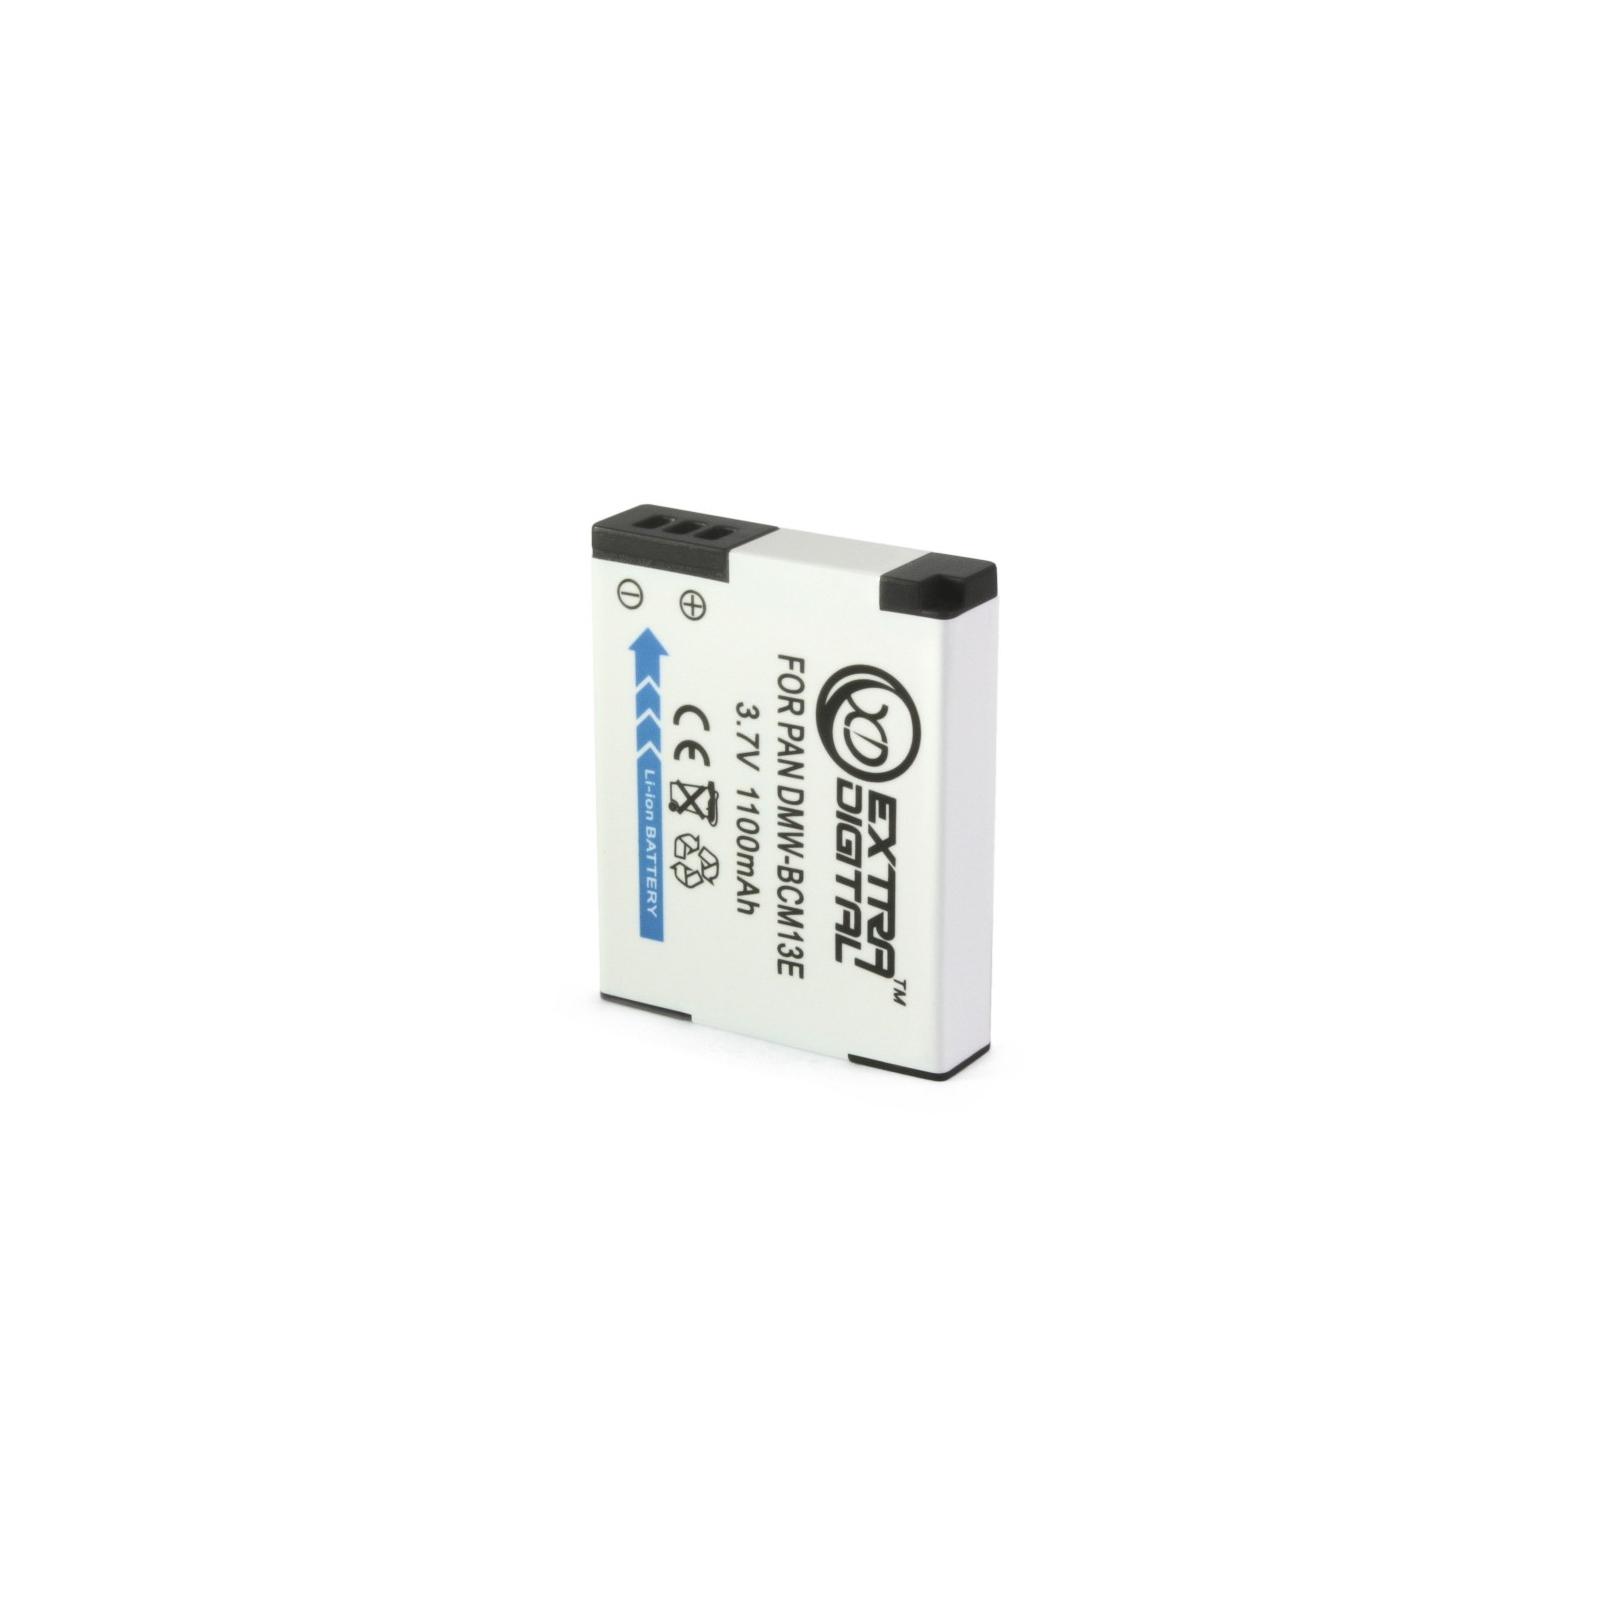 Аккумулятор к фото/видео EXTRADIGITAL Panasonic DMW-BCM13E (BDP1291) изображение 2